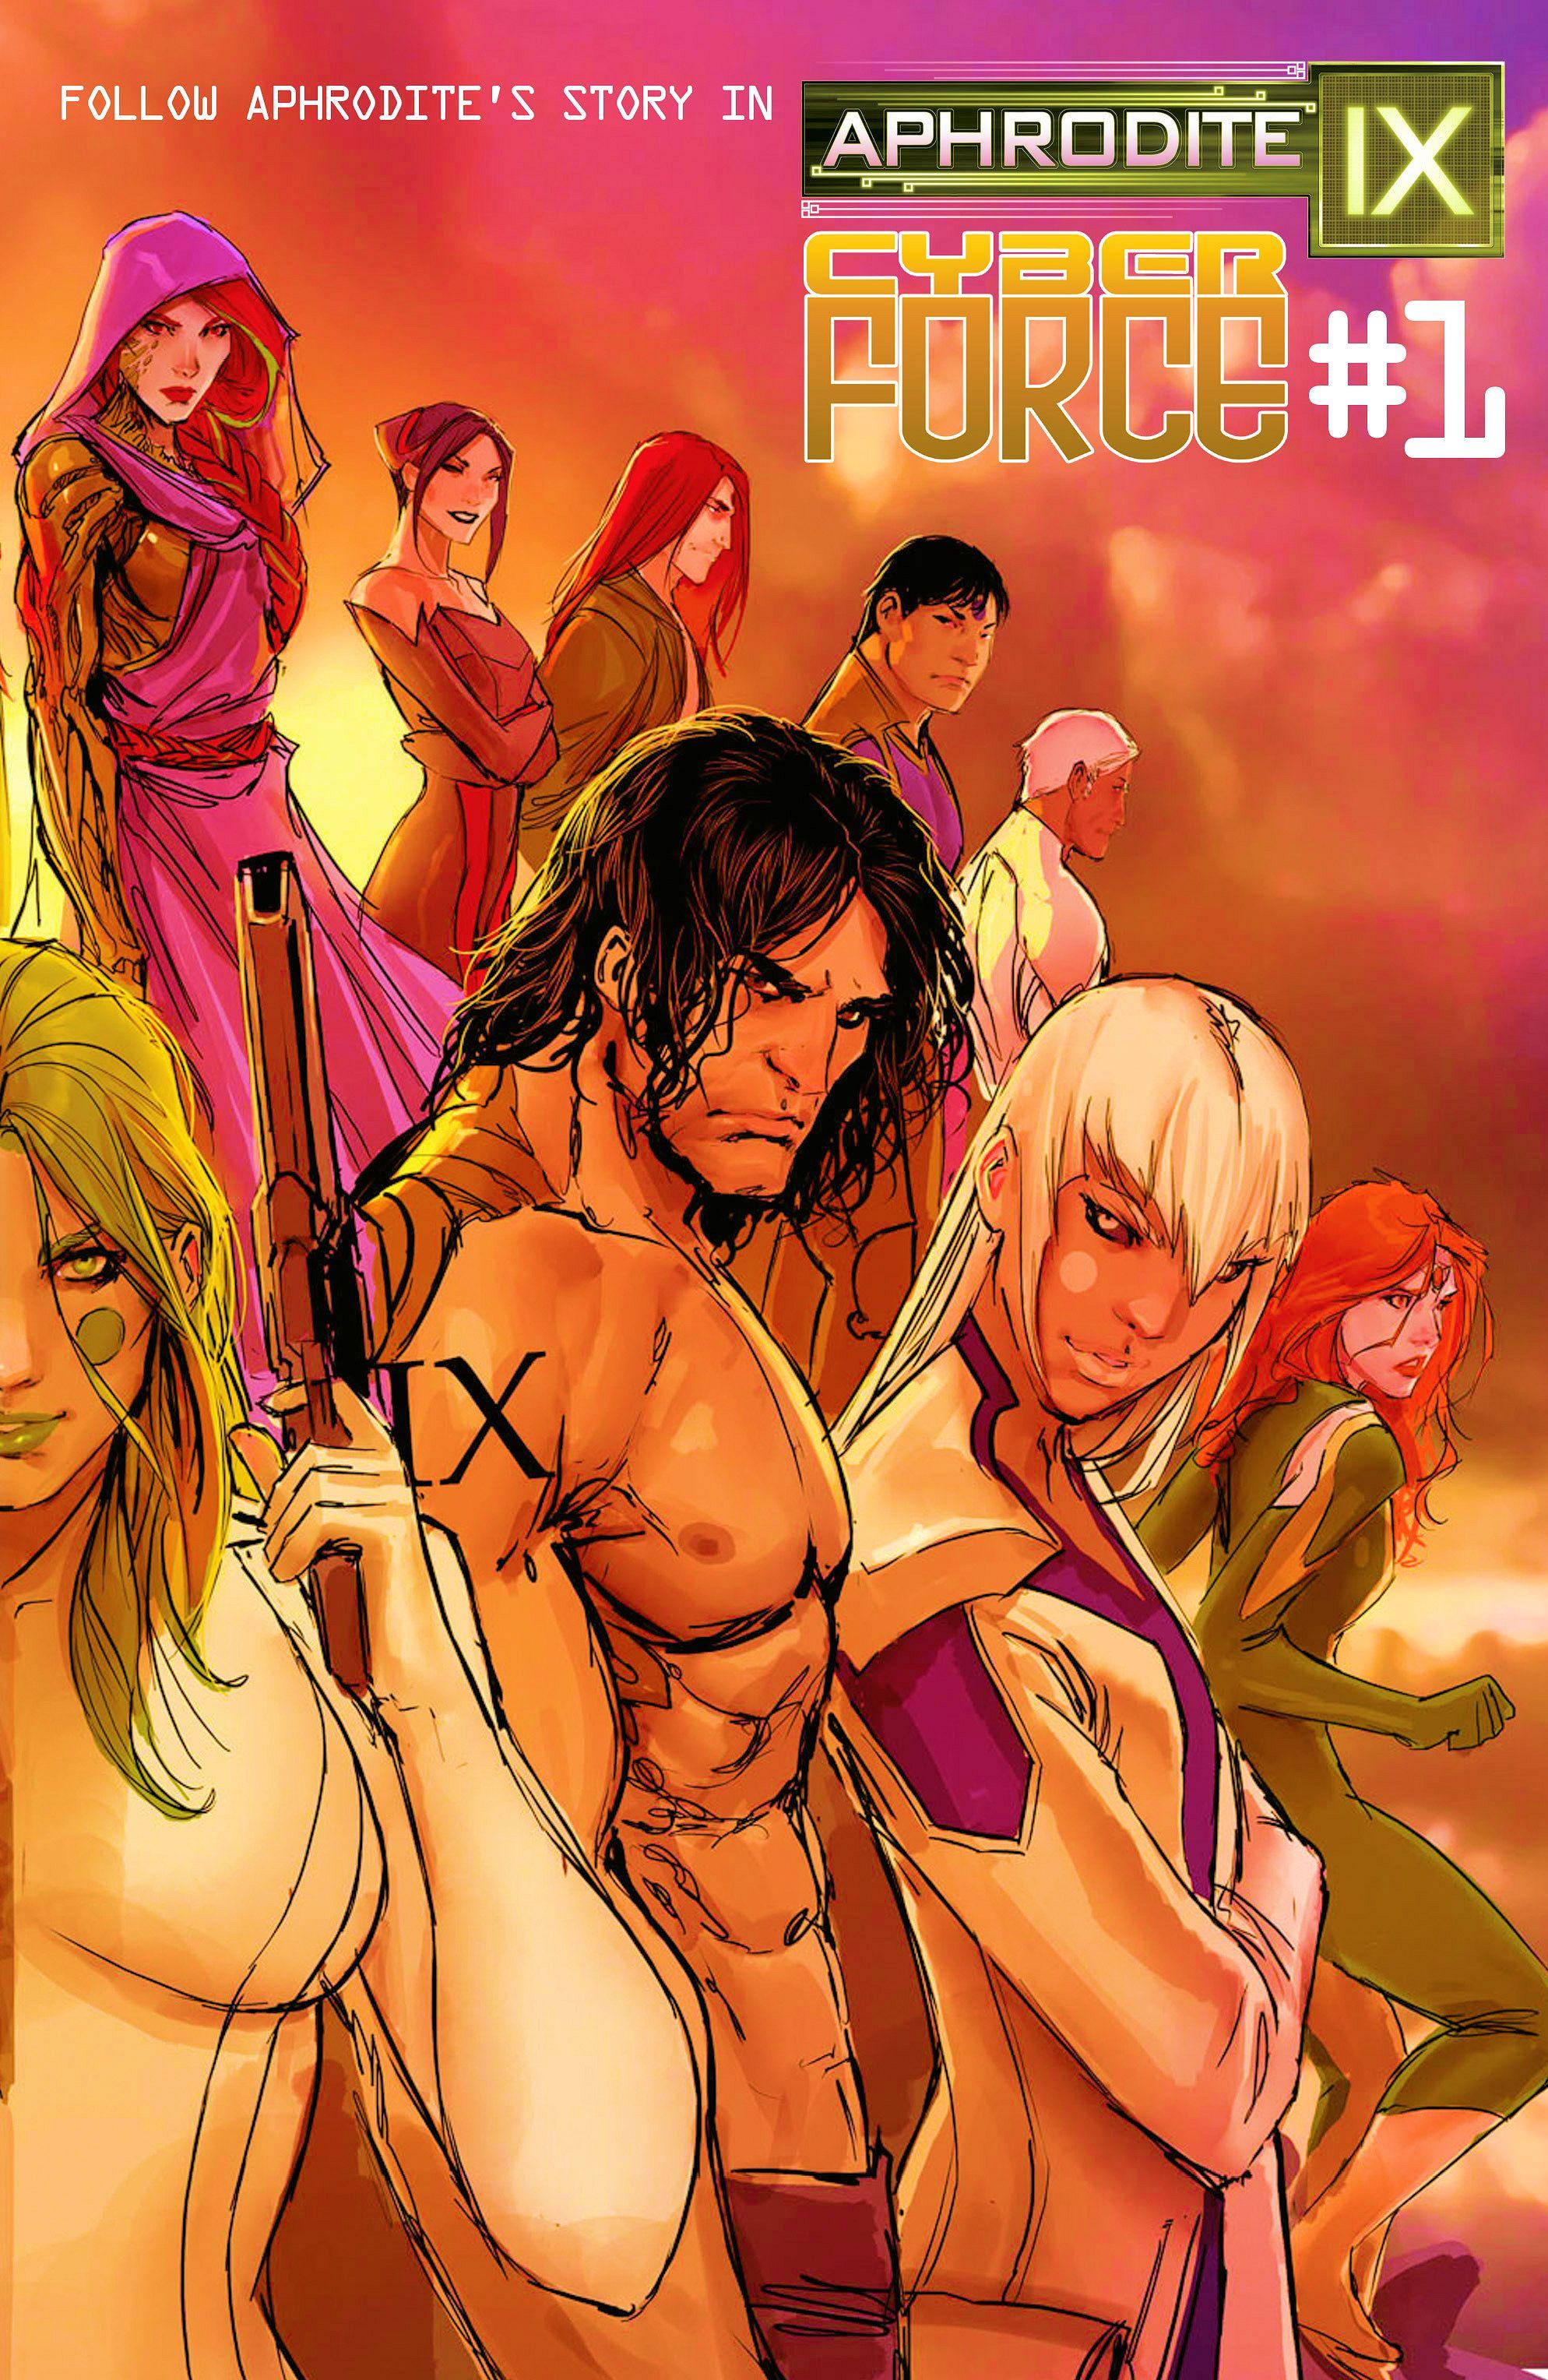 Read online Aphrodite IX (2013) comic -  Issue #11 - 27